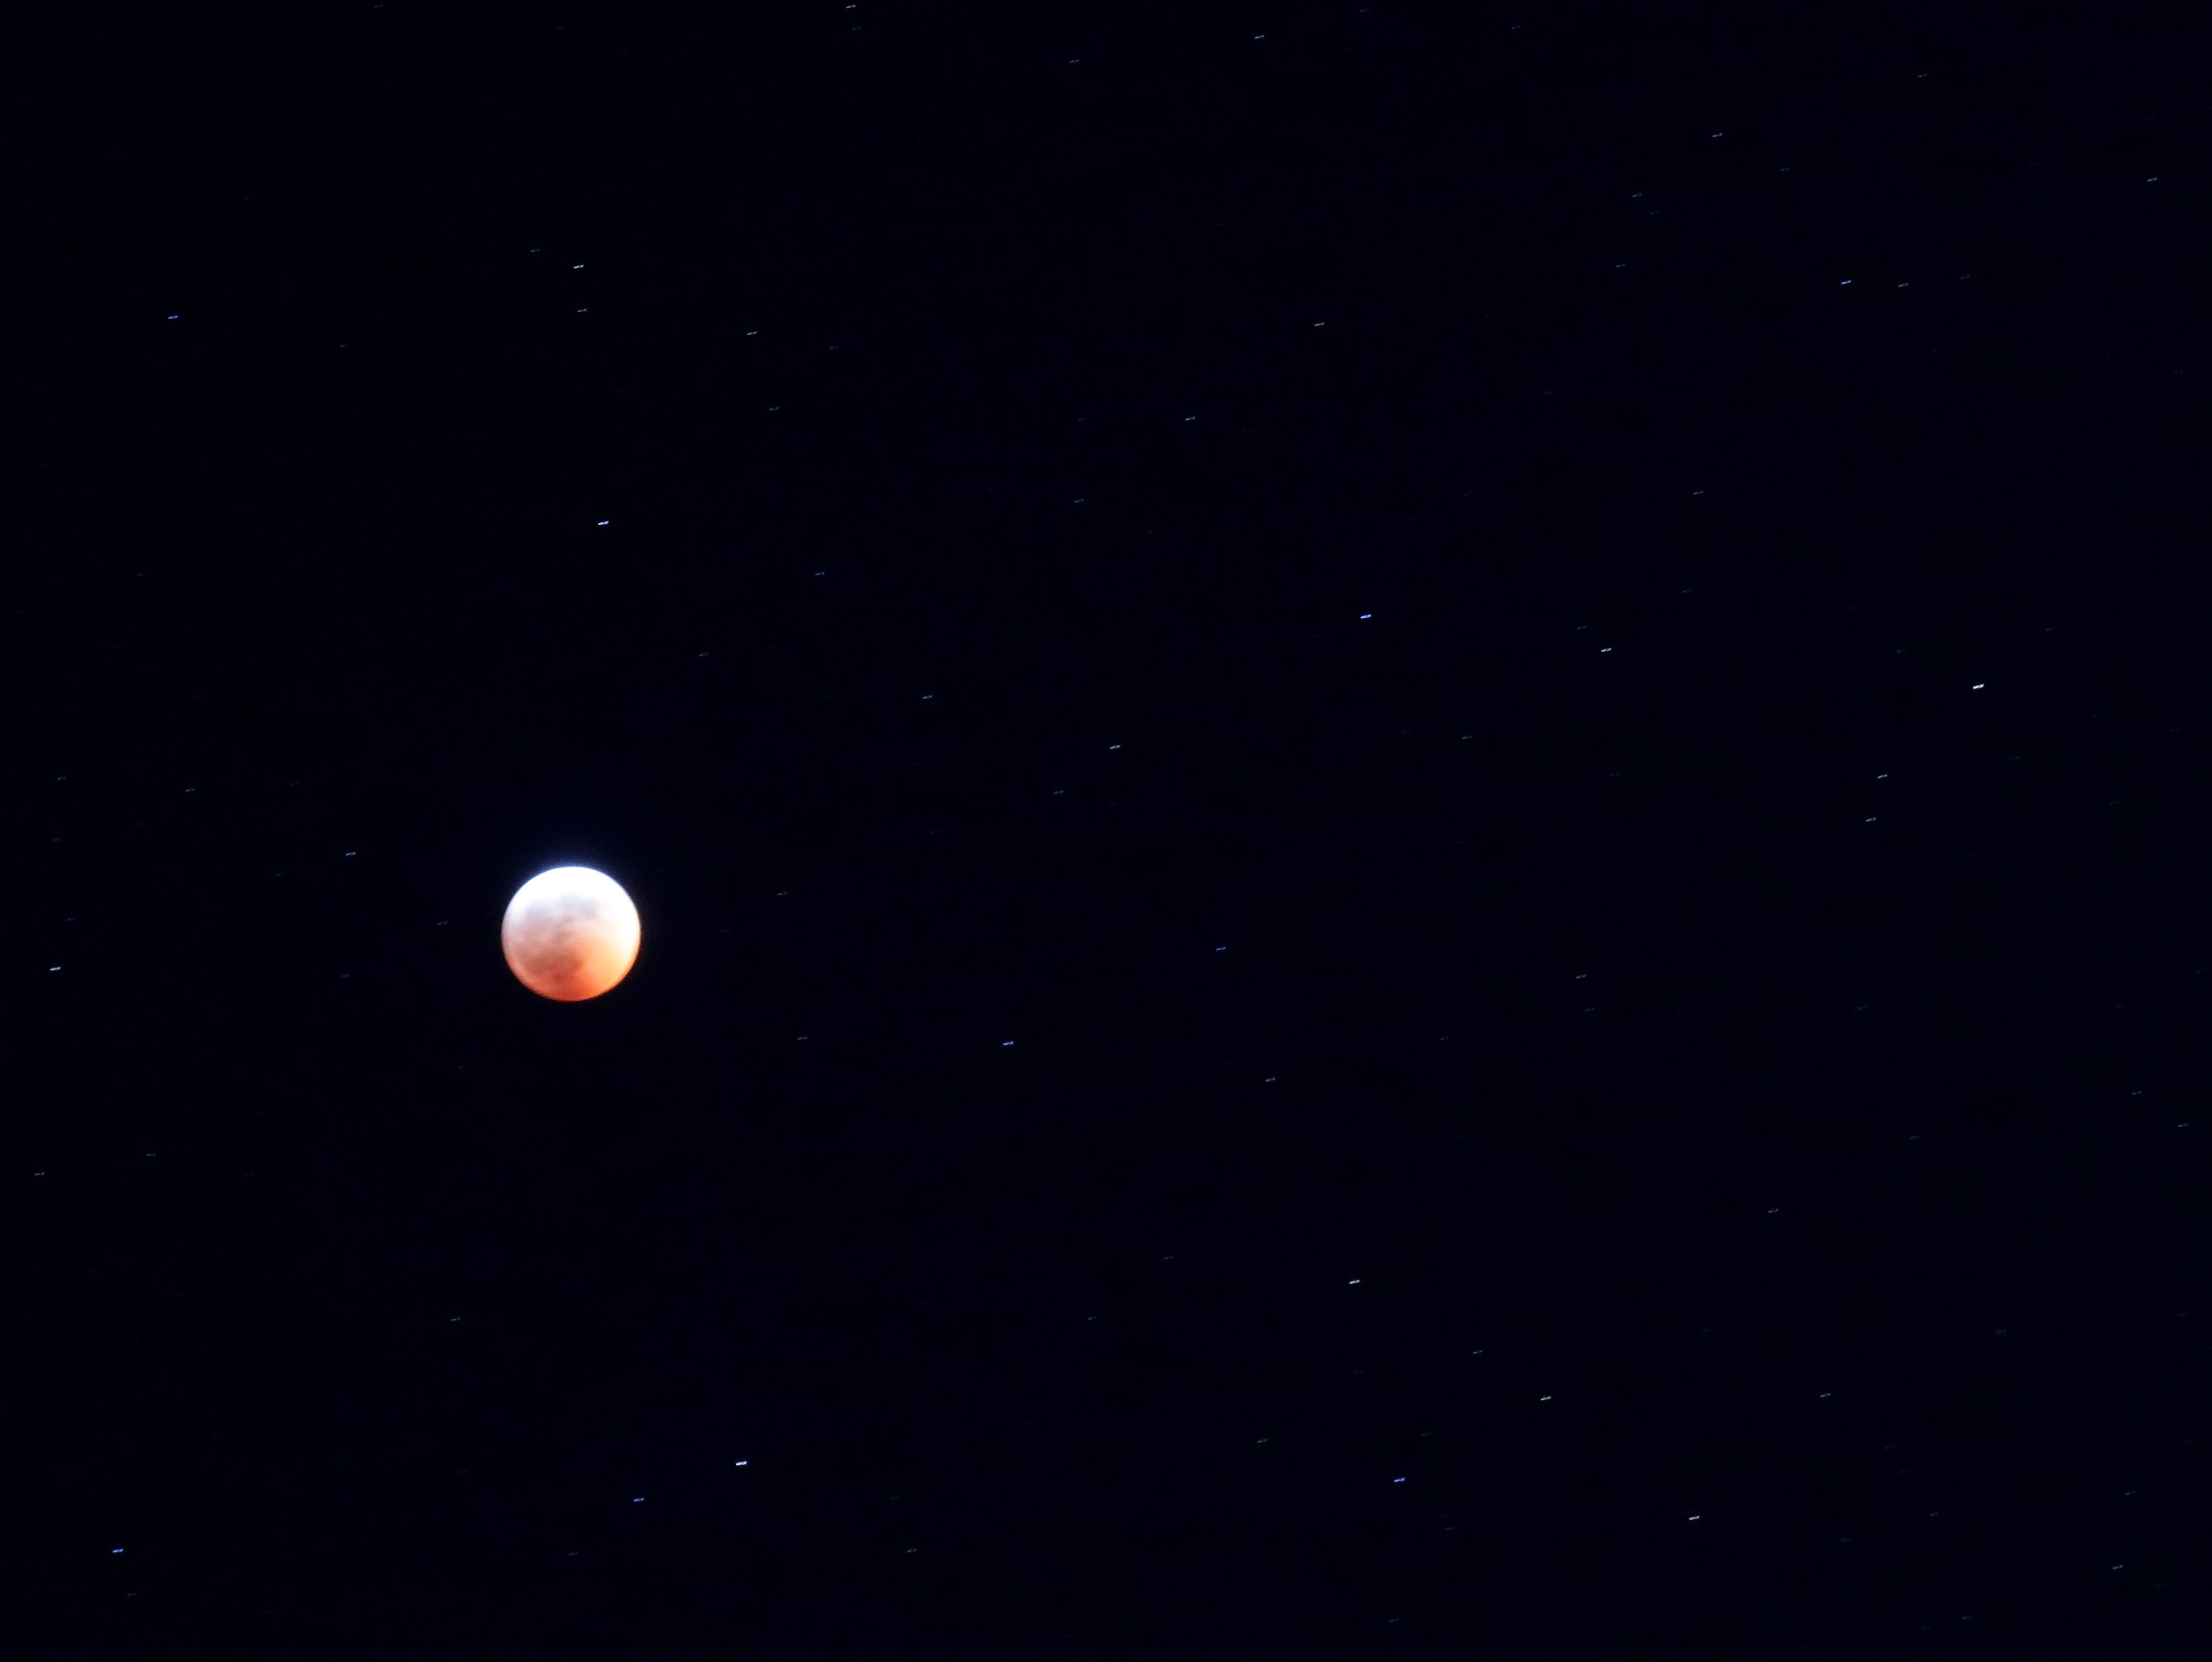 A total lunar eclipse blood moon is seen.